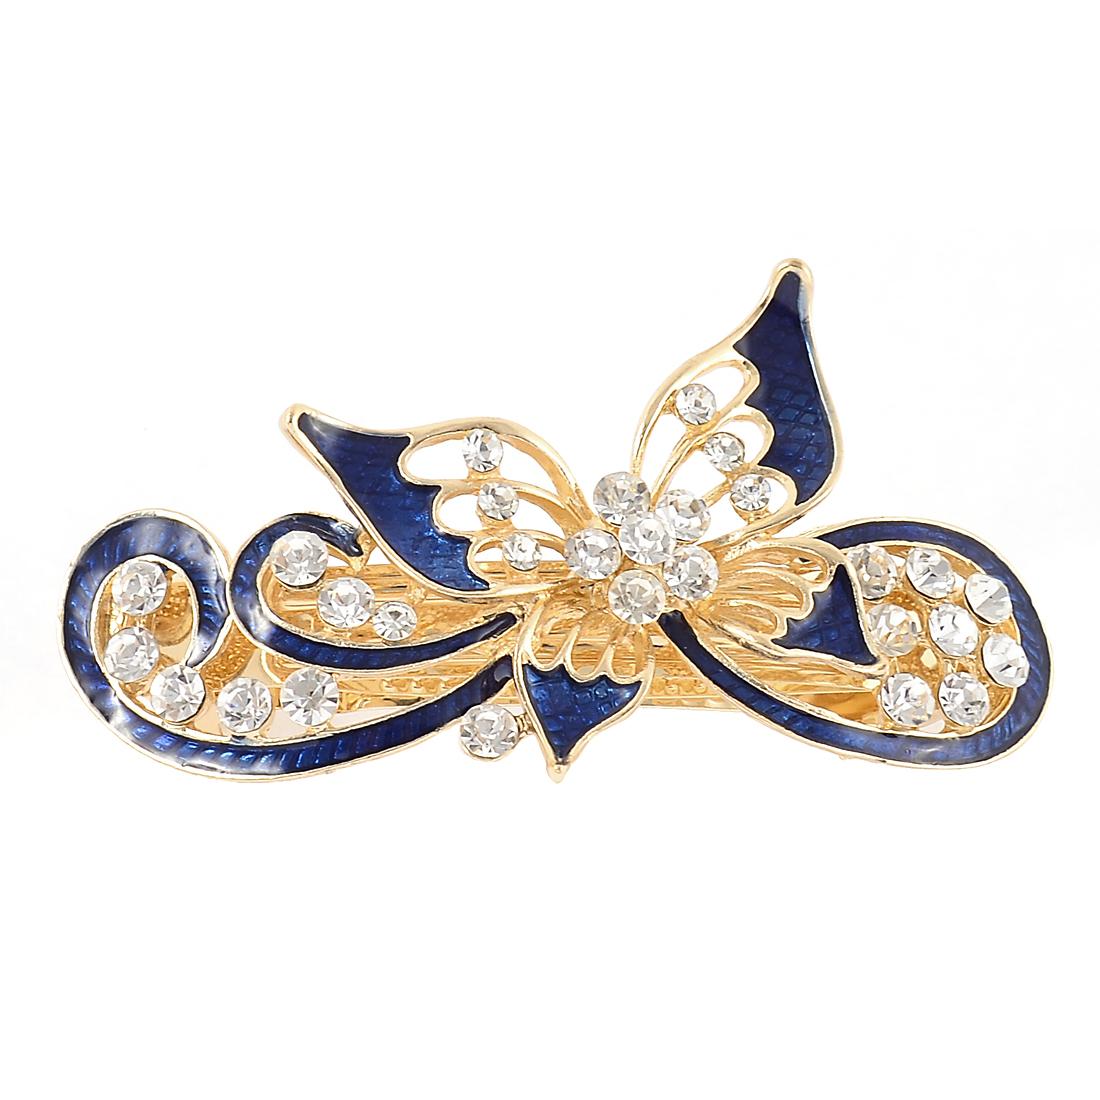 Women Rhinestone Decor Butterfly Design French Hair Barrette Clip Hairpin Blue